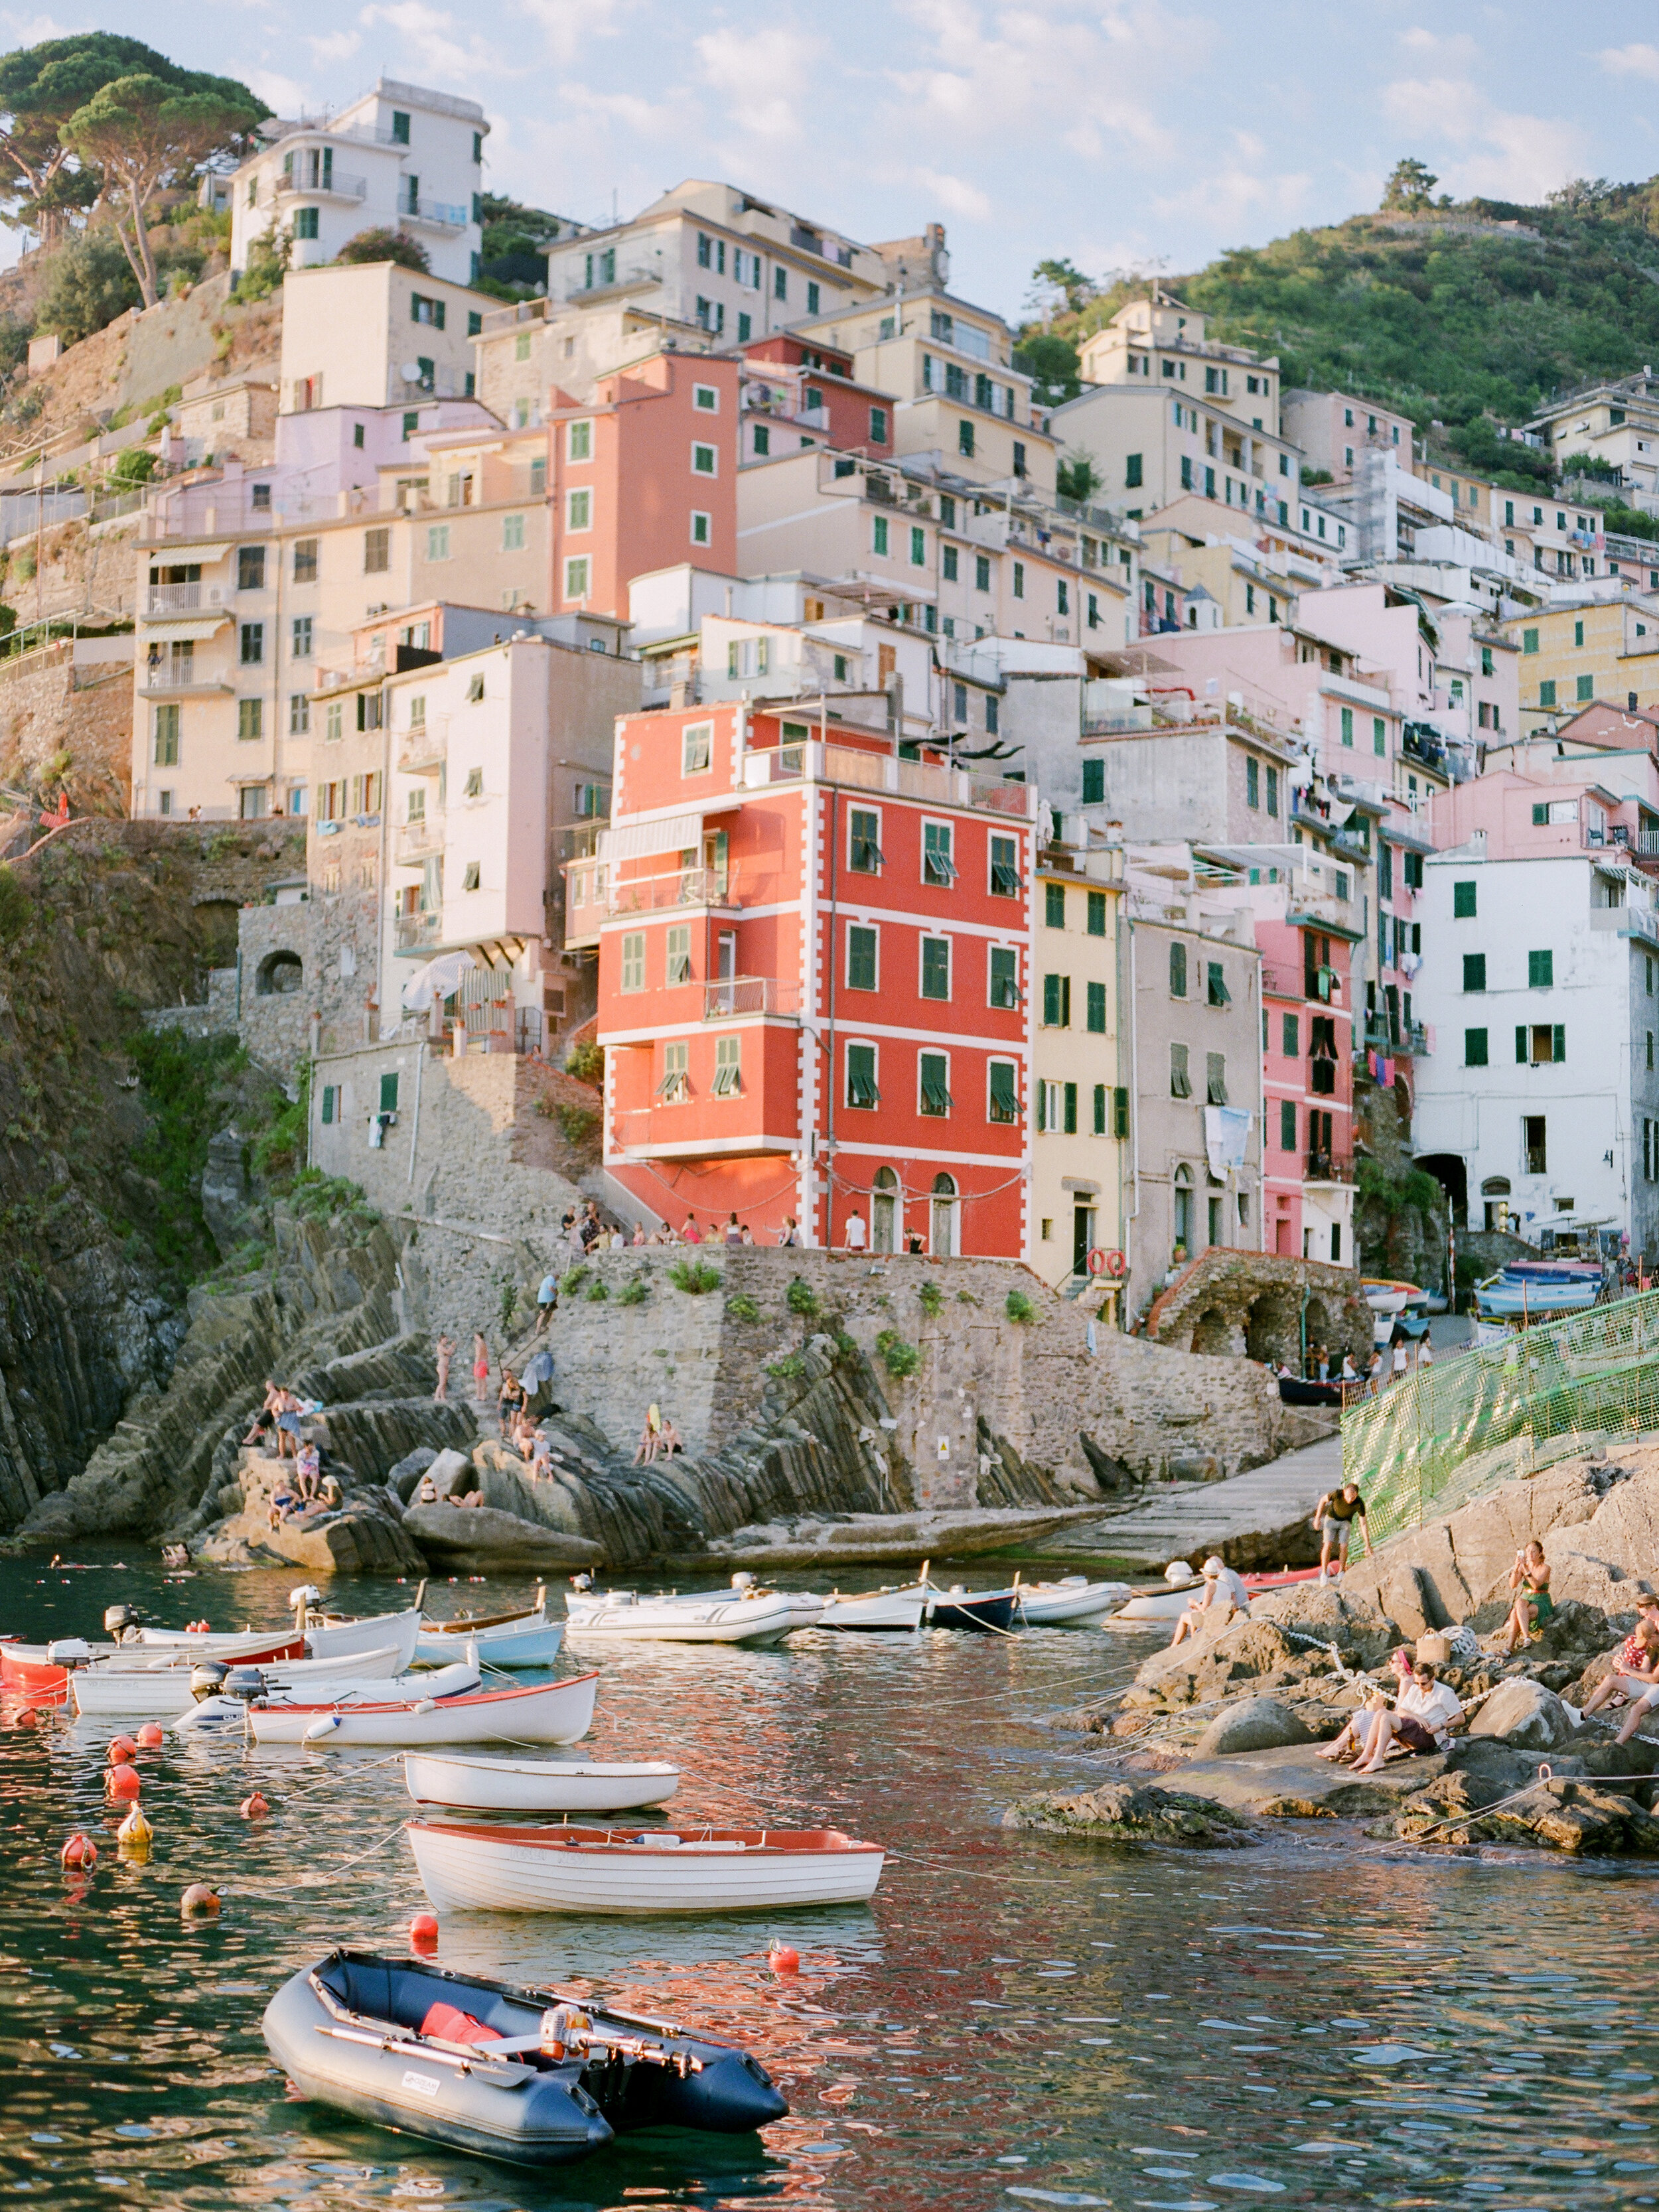 ItalyFilm_104.jpg